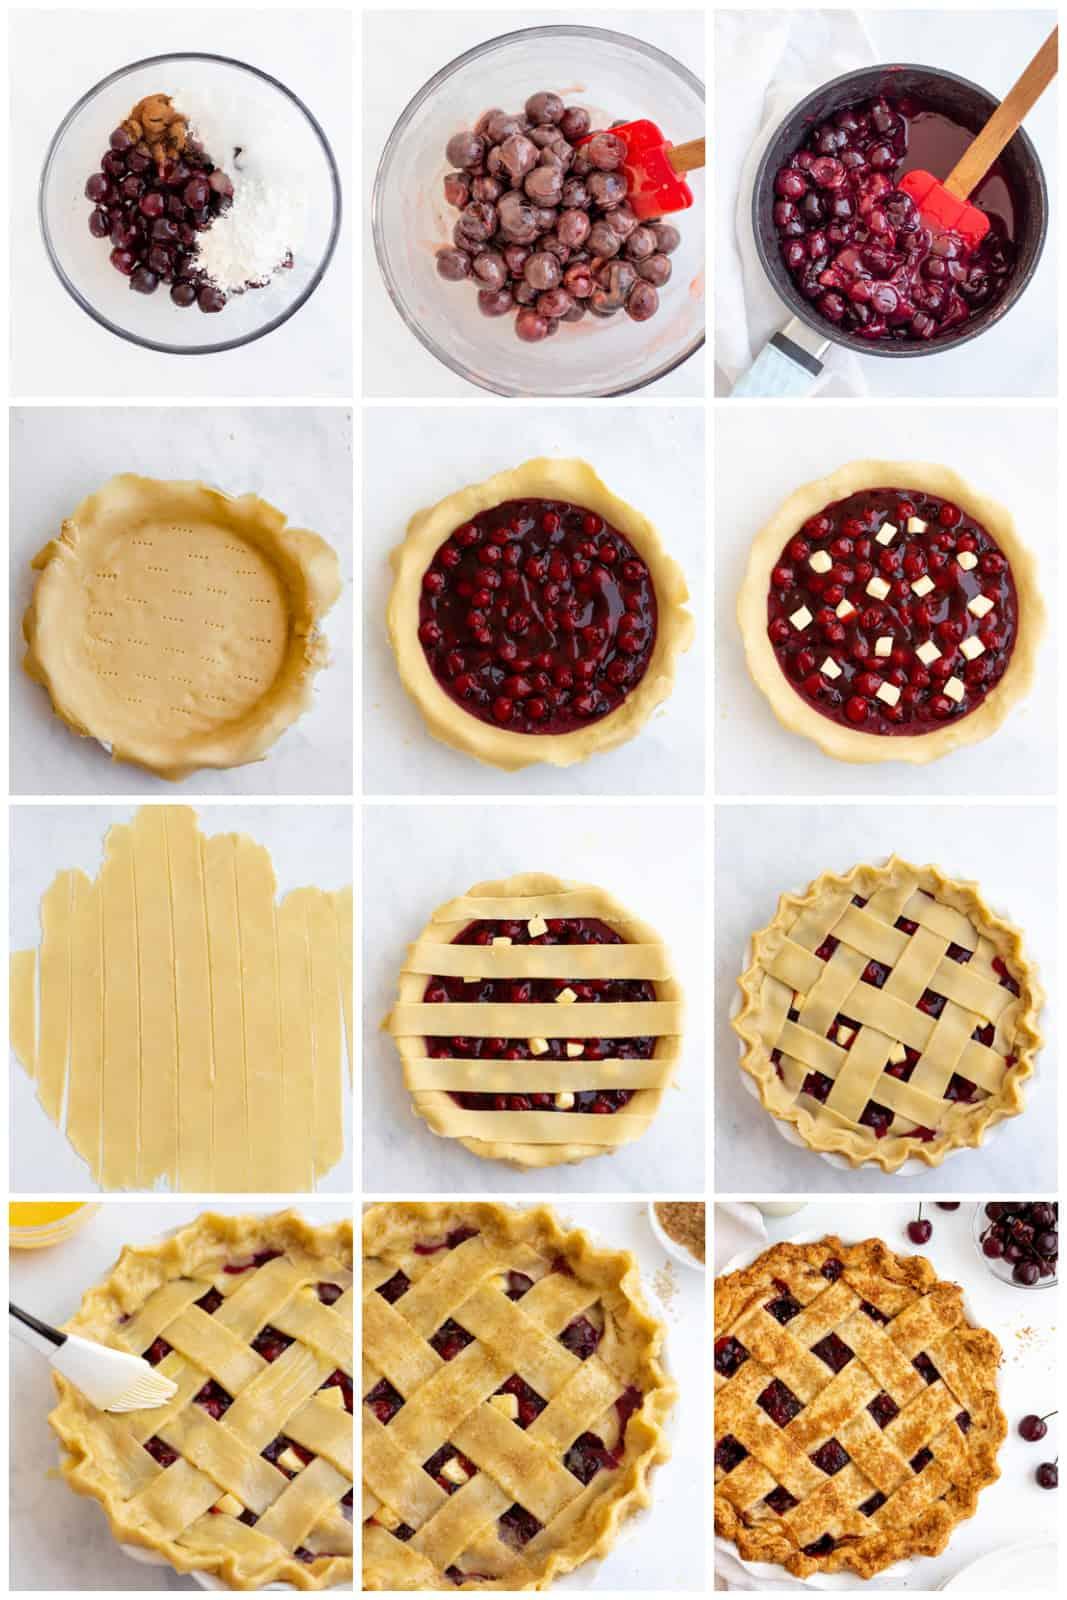 Step by step photos on how too make a Cherry Pie Recipe